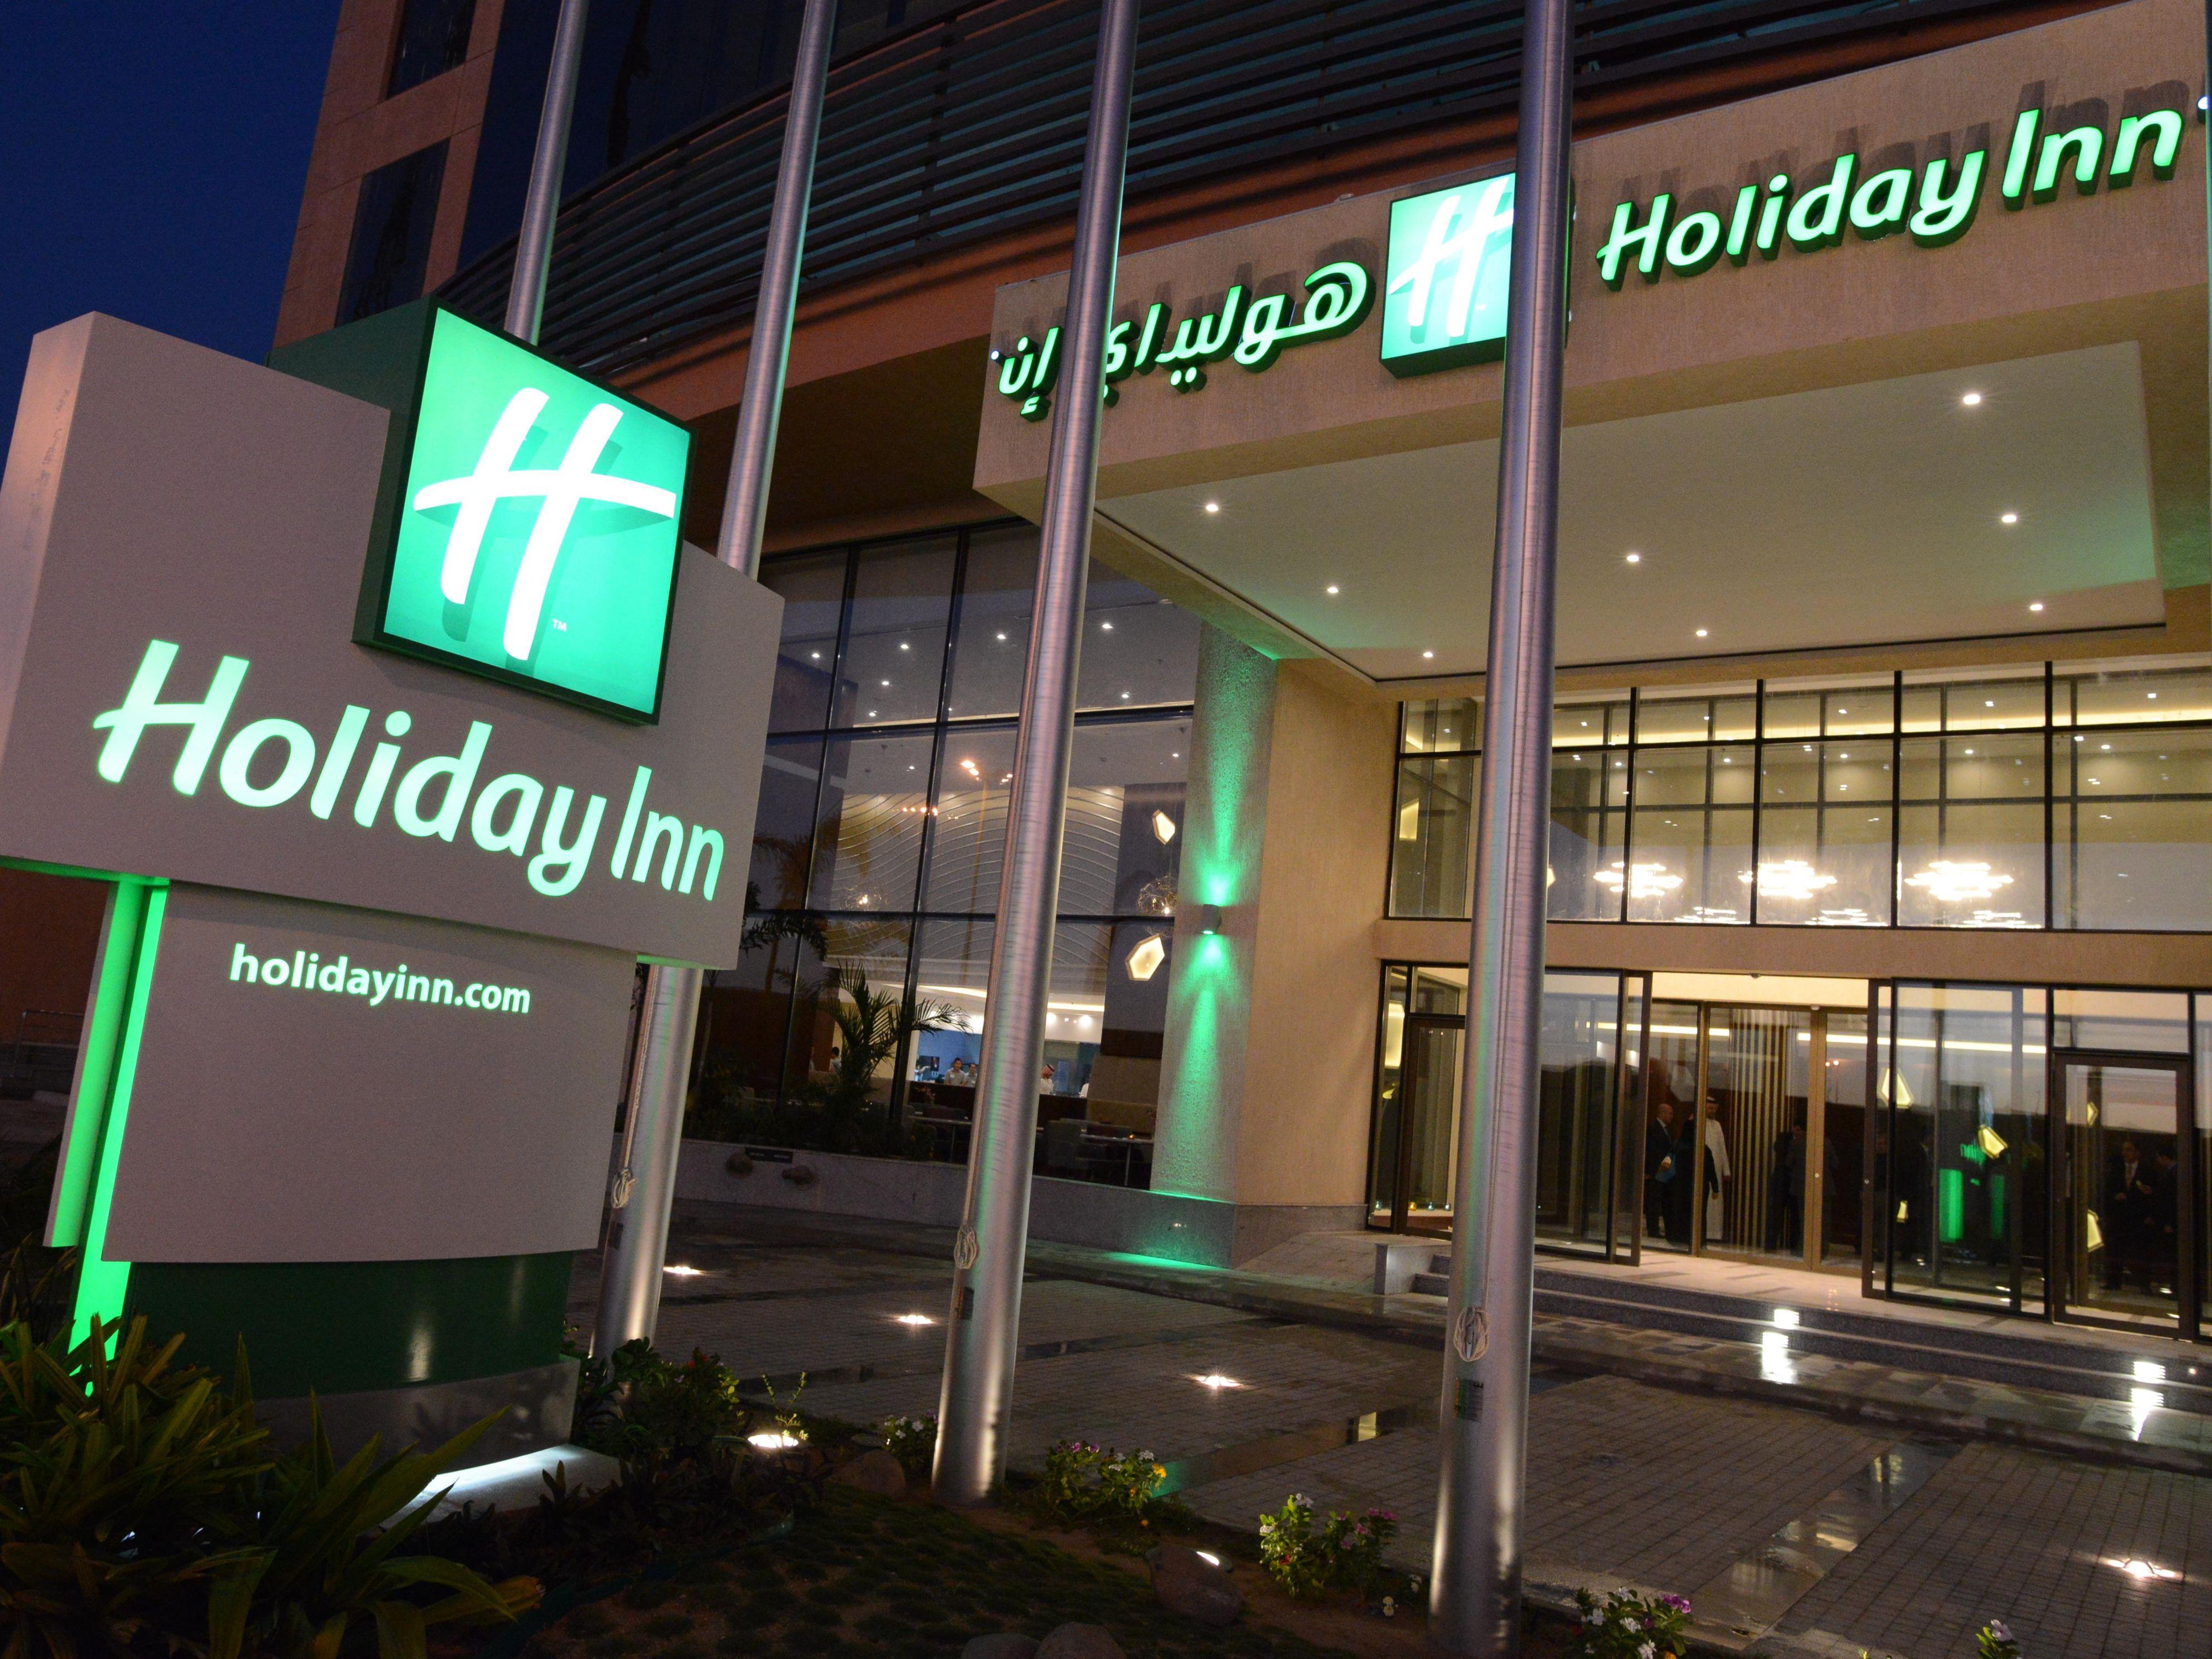 dur hospitality set to open first holiday inn franchise in tabuk rh argaam com